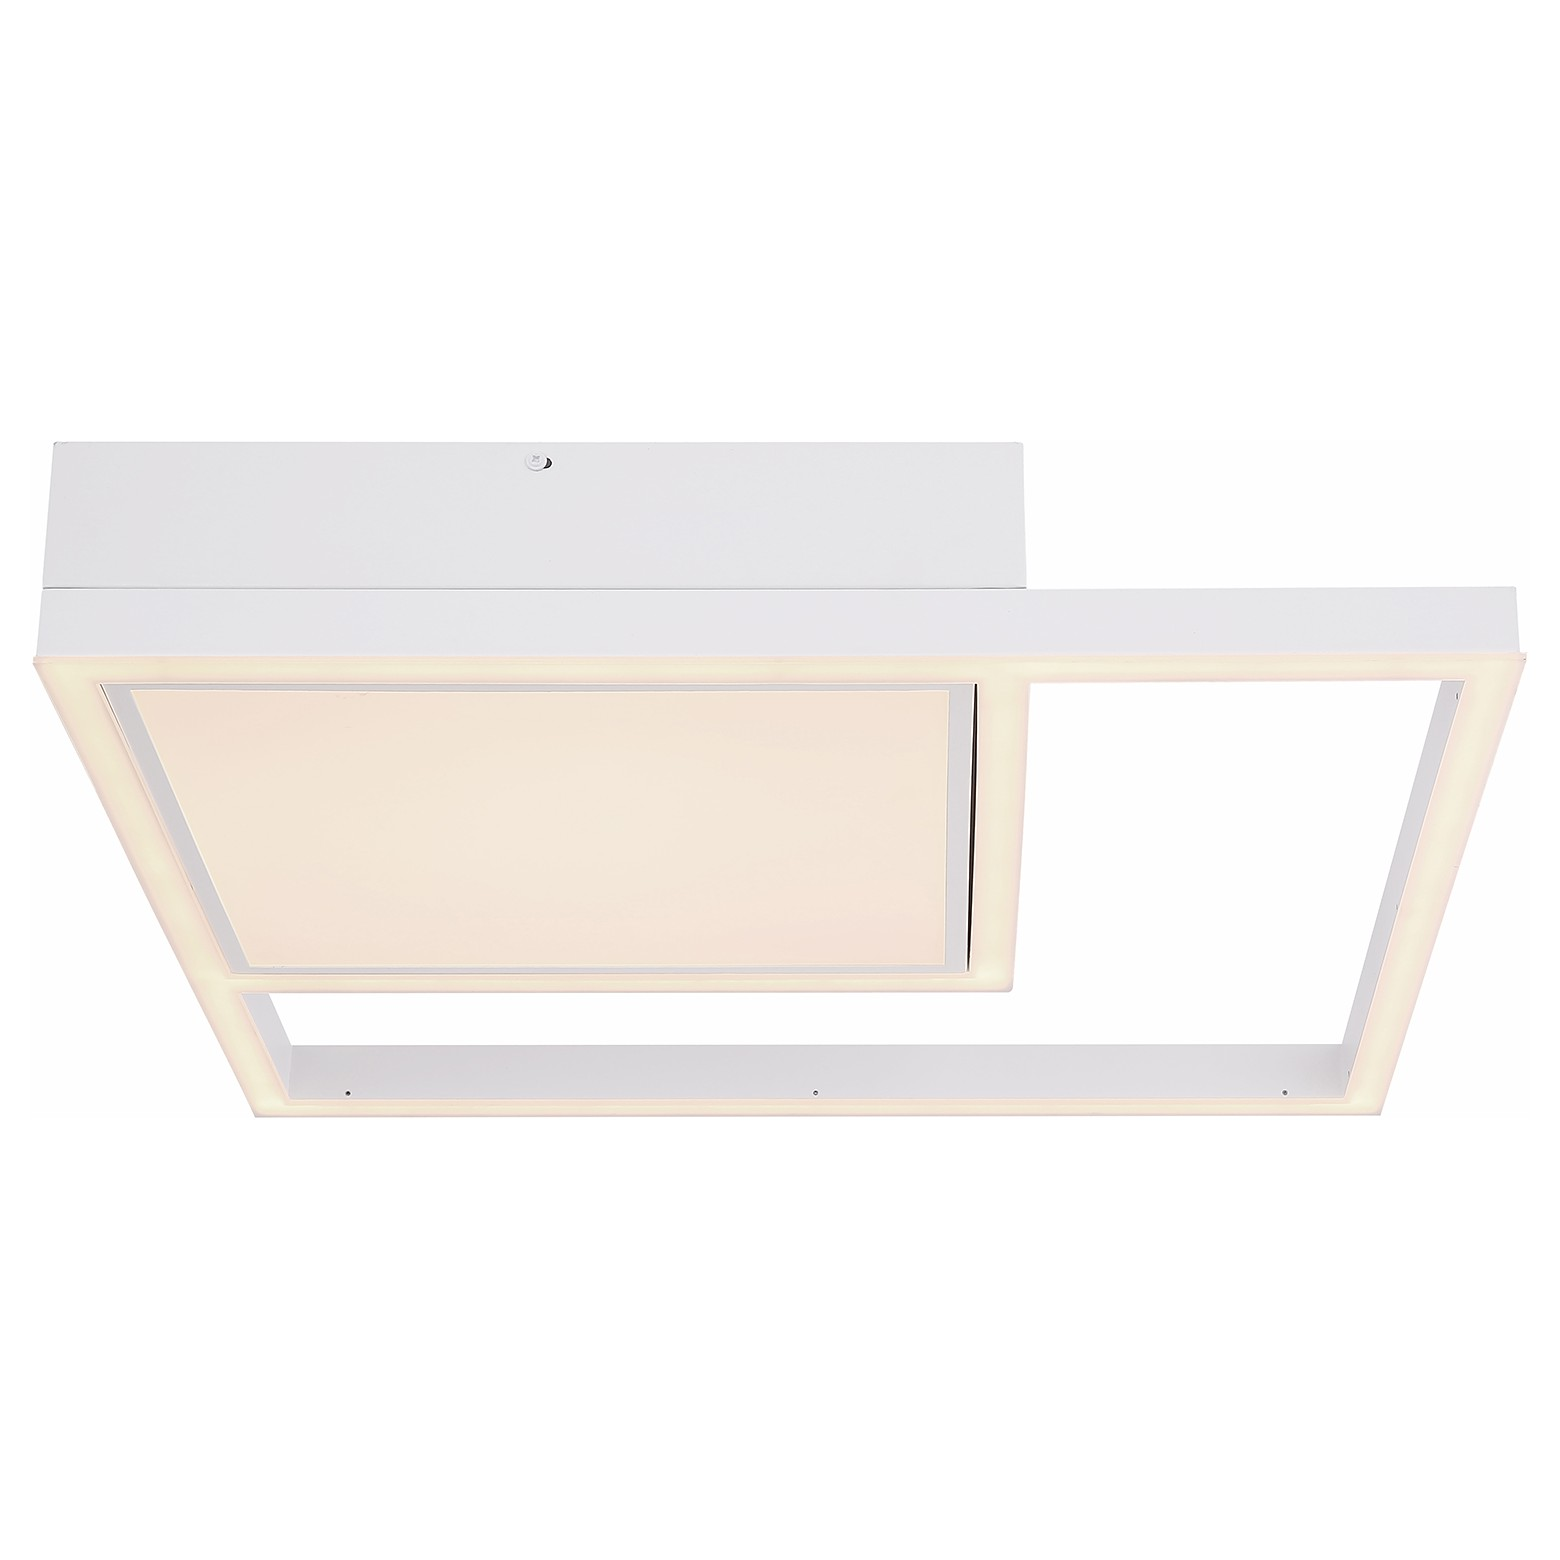 home24 LED-Deckenleuchte Squares I